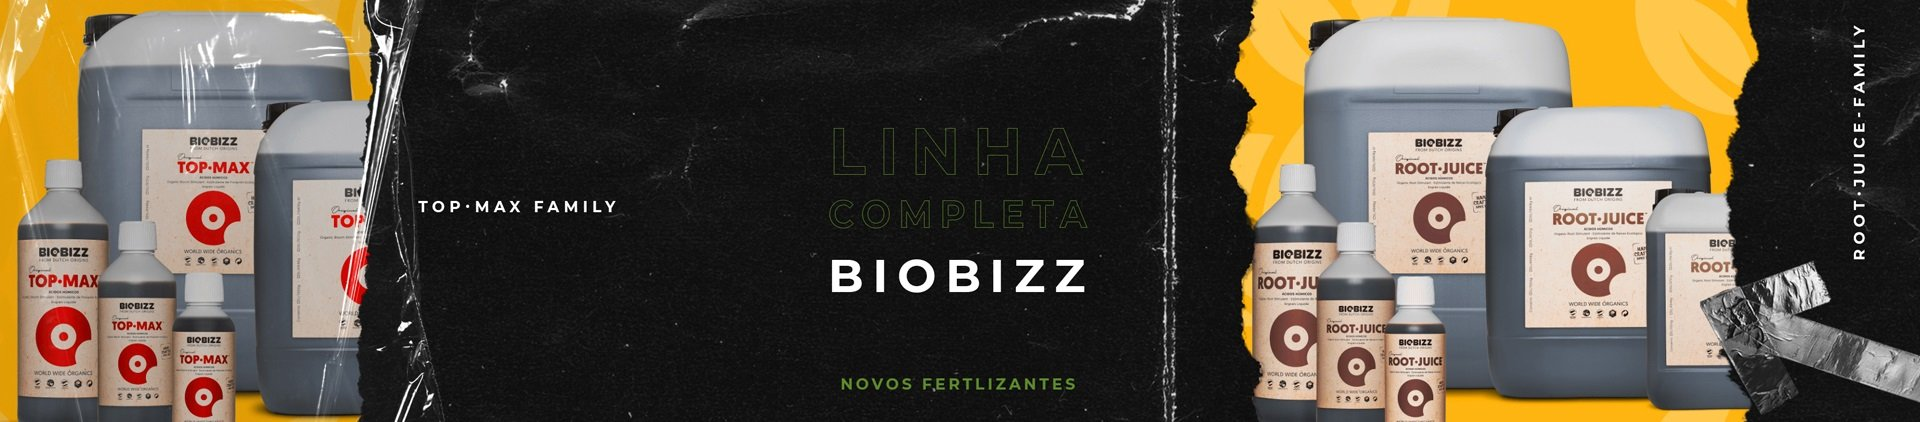 Novo biobizz 1